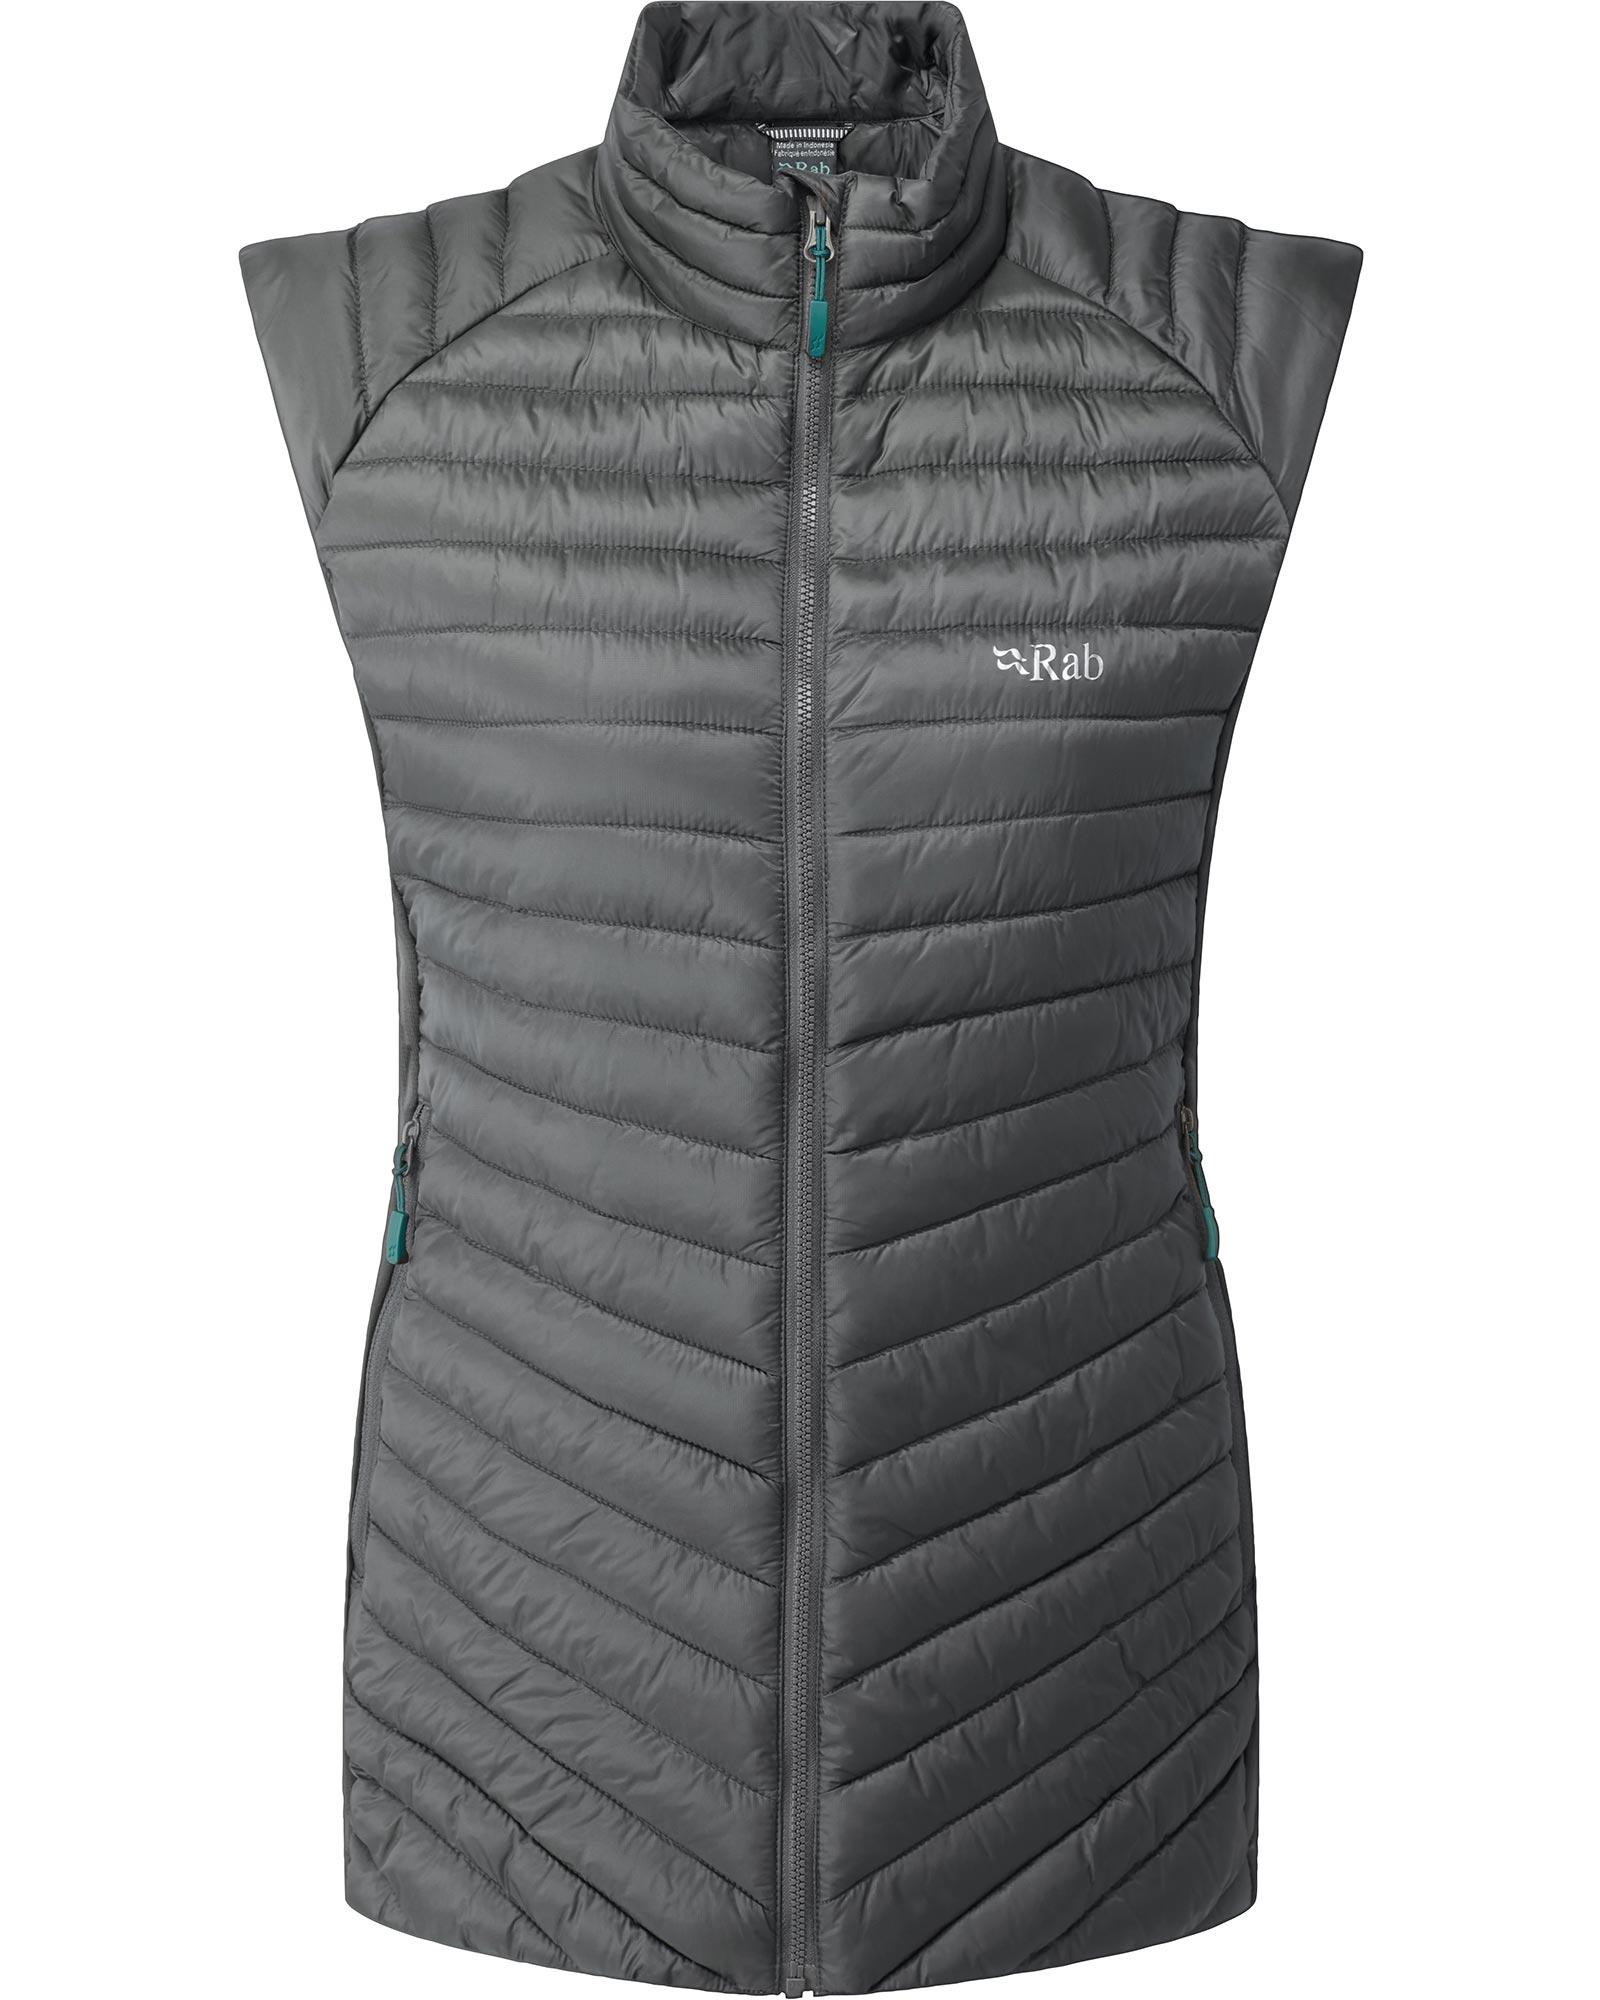 Rab Women's Cirrus Flex Vest Steel 0